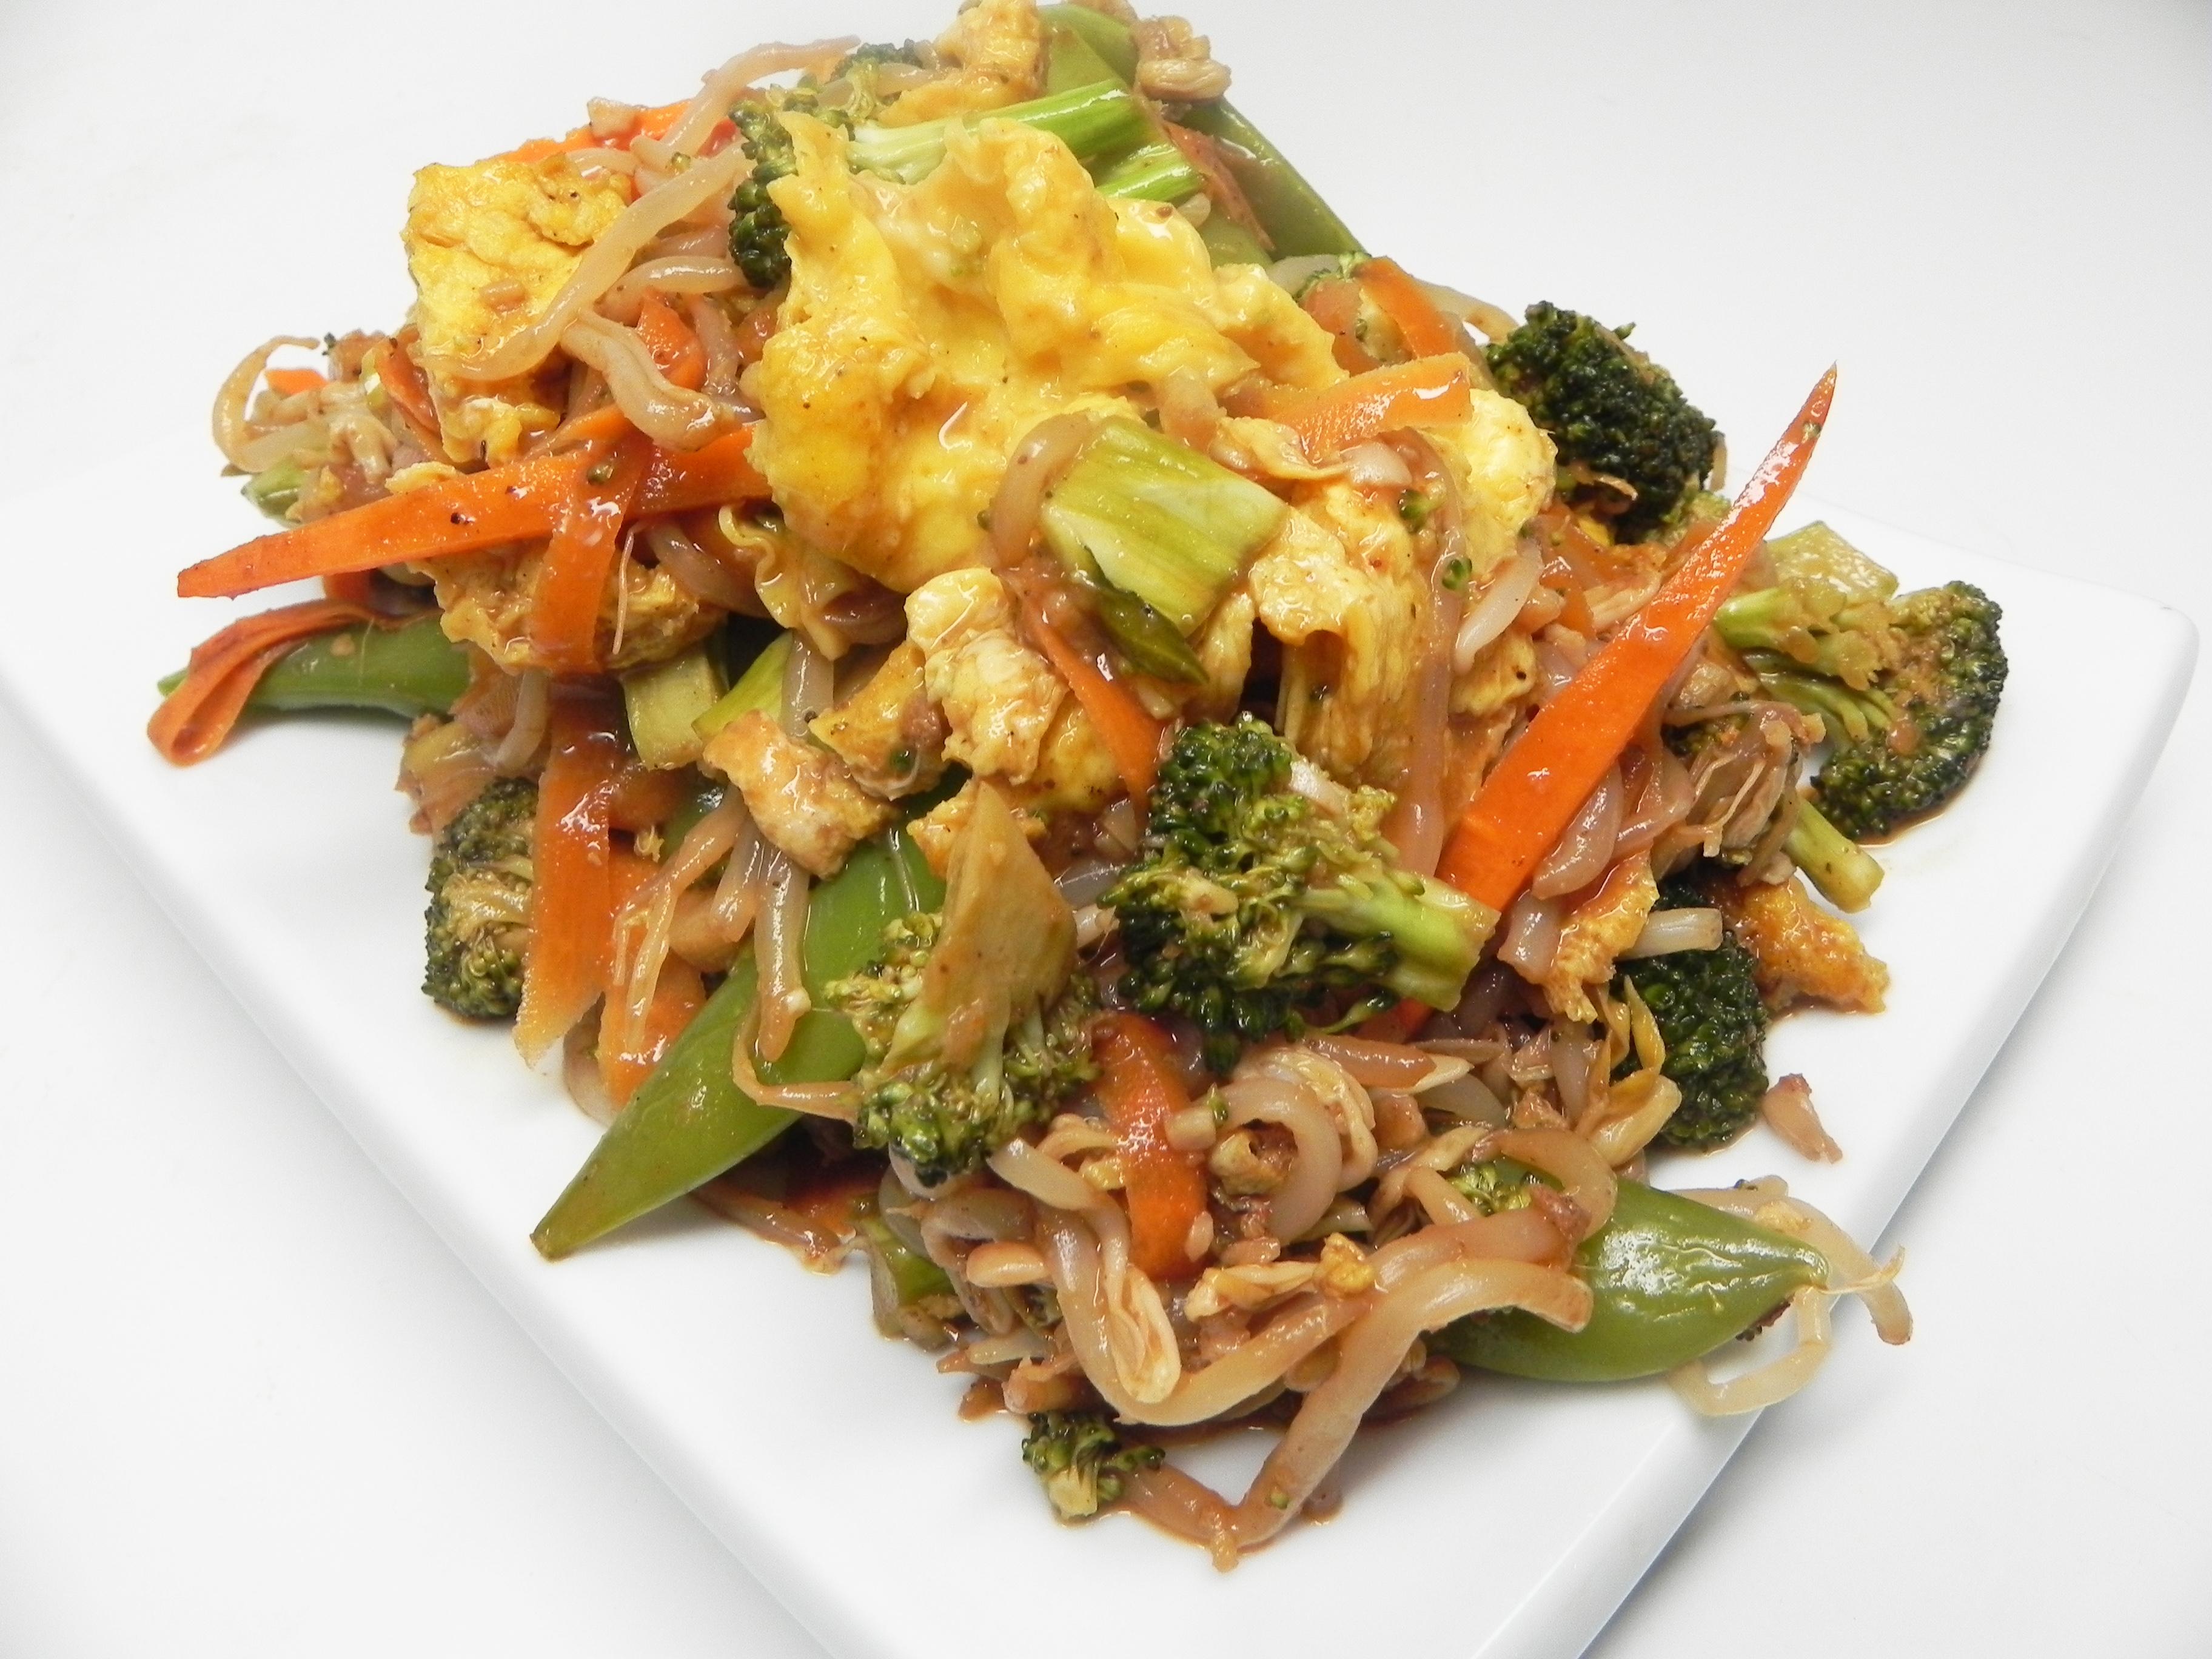 Moo Shu Vegetable Stir Fry